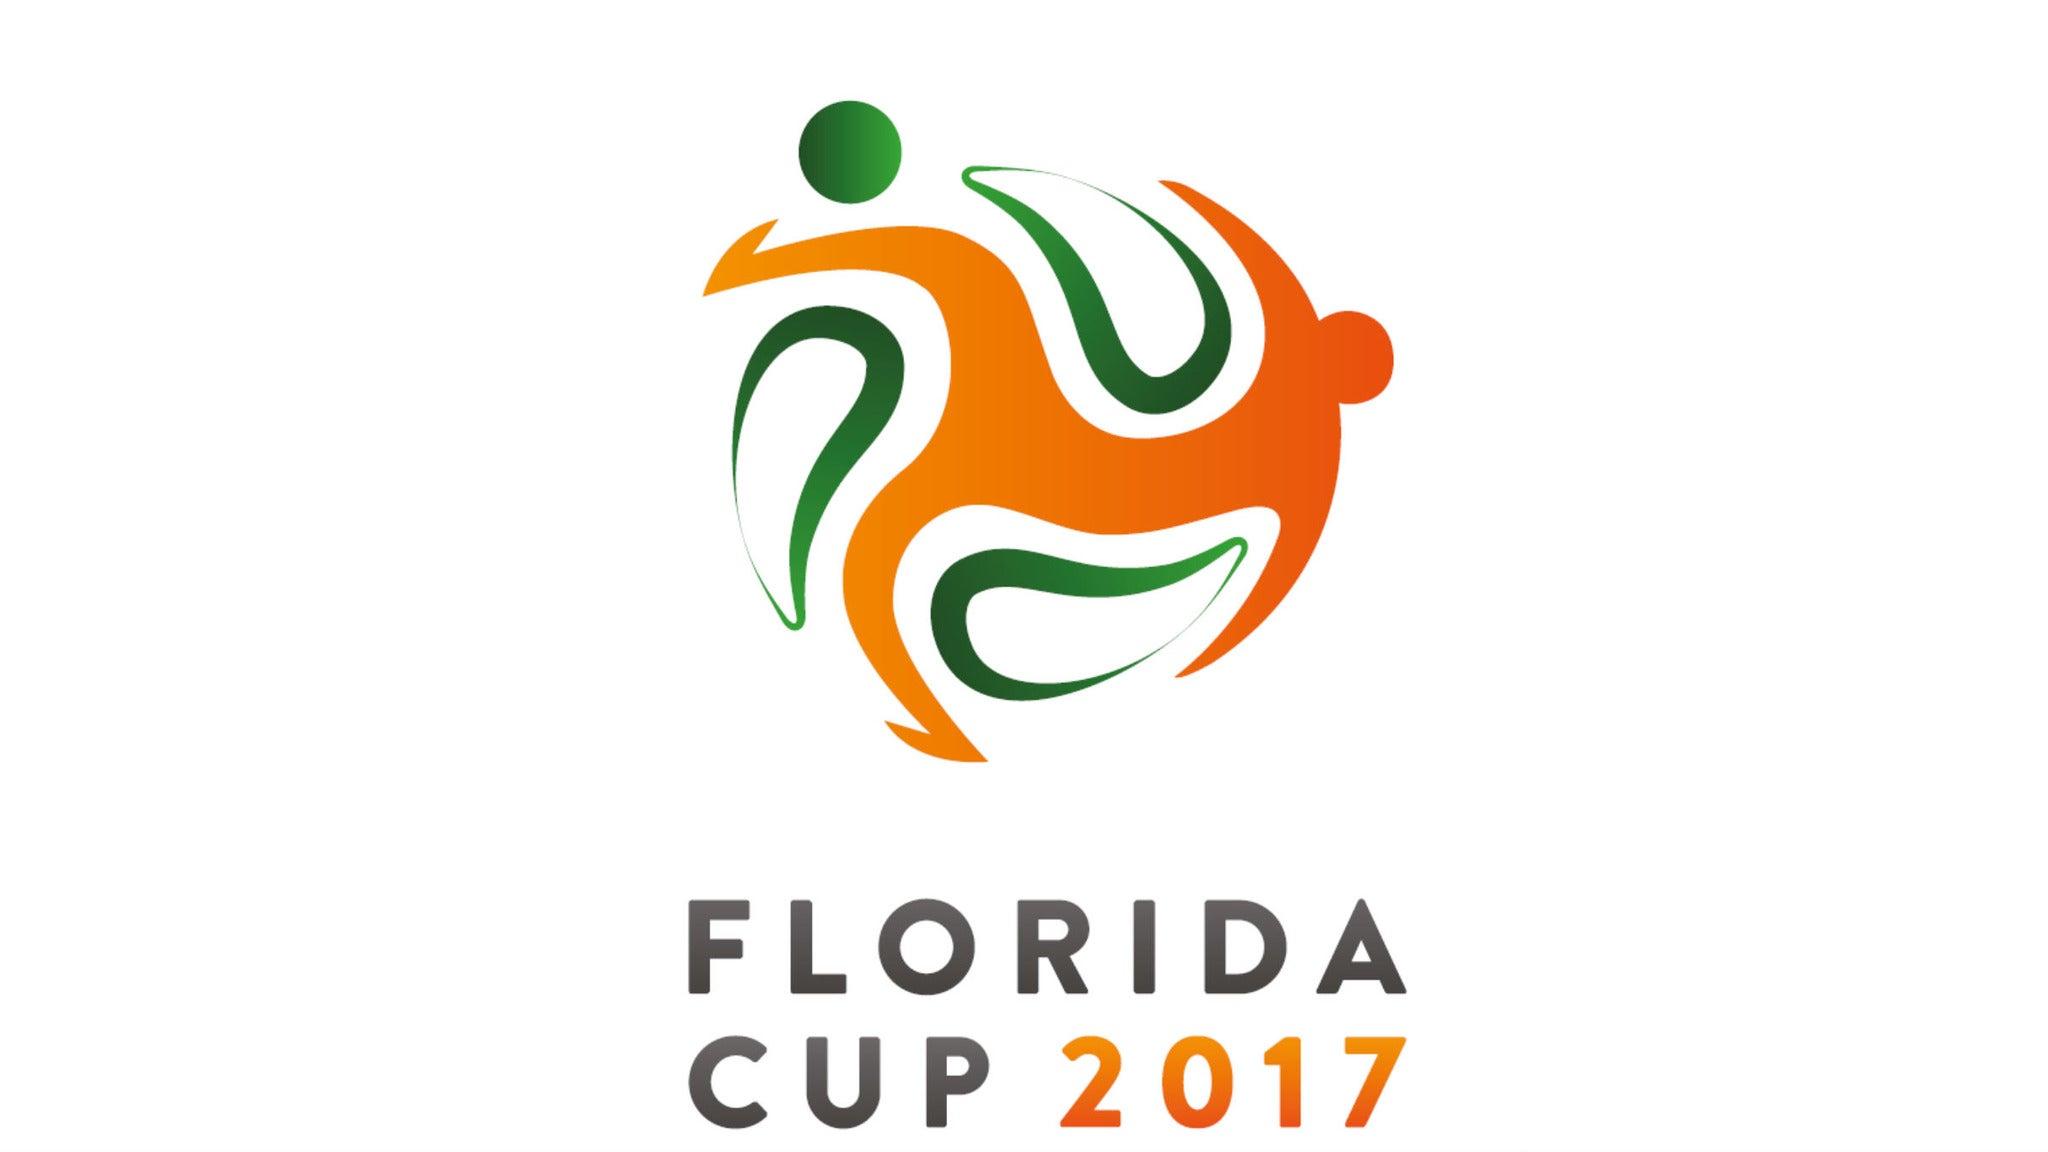 Florida Cup: Playoff Semi-finals